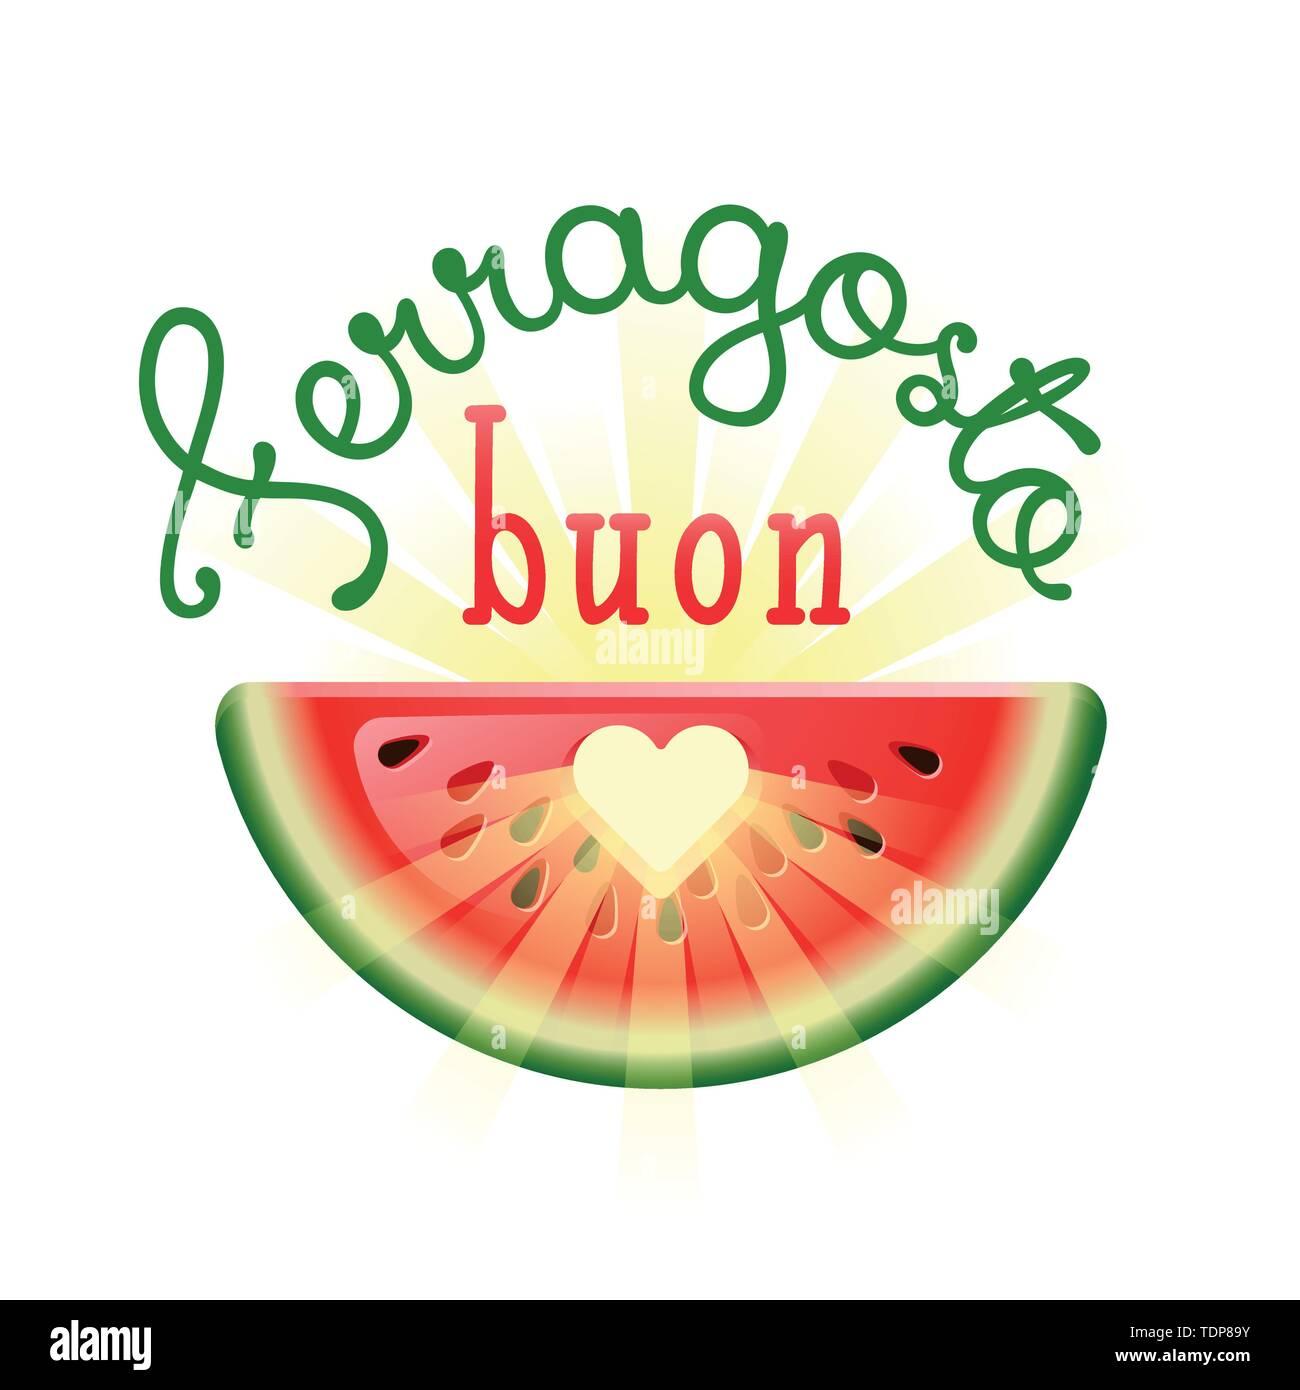 Buon Ferragosto. Happy Summer Holidays in Italian. Italian summer festival concept with heart in watermelon and sunbeams. Vector illustration. - Stock Image